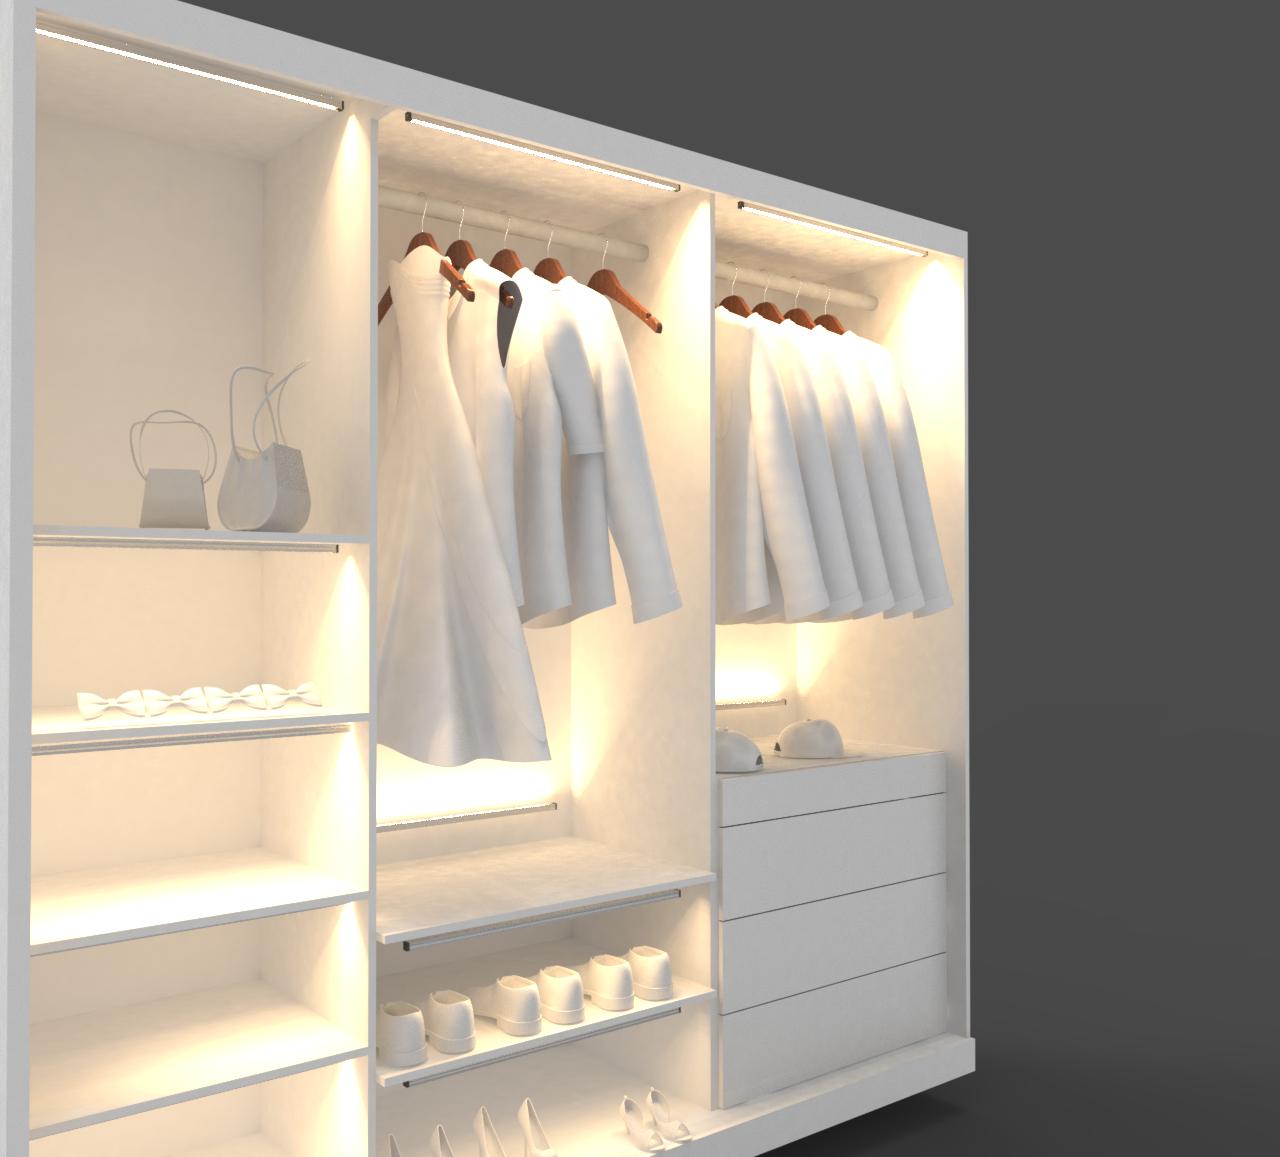 Closet Lighting Idea Closet Lighting Closet Designs Wardrobe Lighting